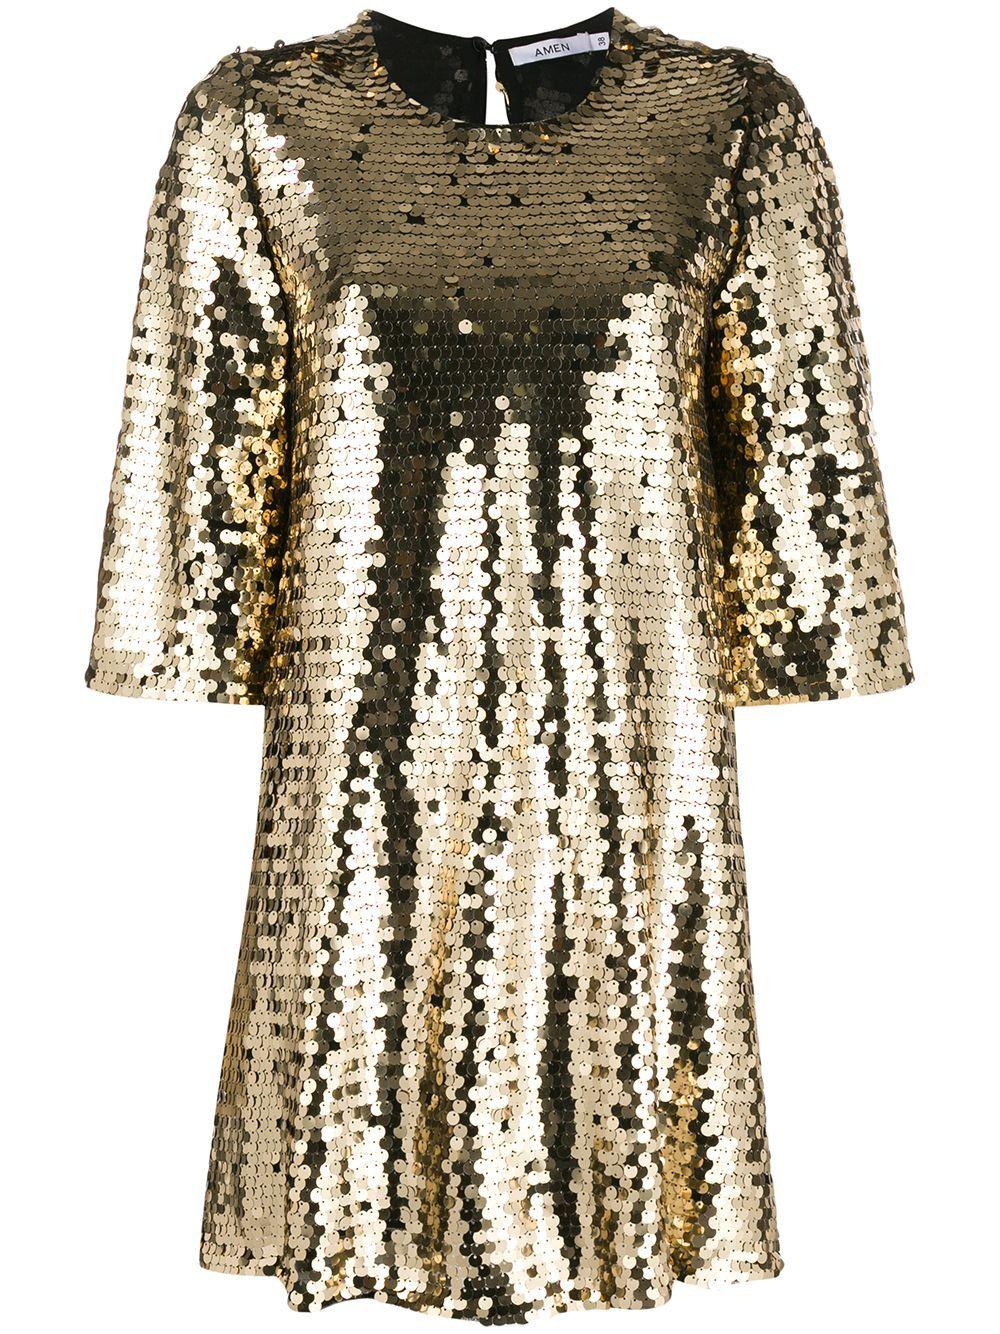 Amen Sequin Shift Dress Farfetch Shift Dress New Years Eve Dresses Dresses [ 1334 x 1000 Pixel ]